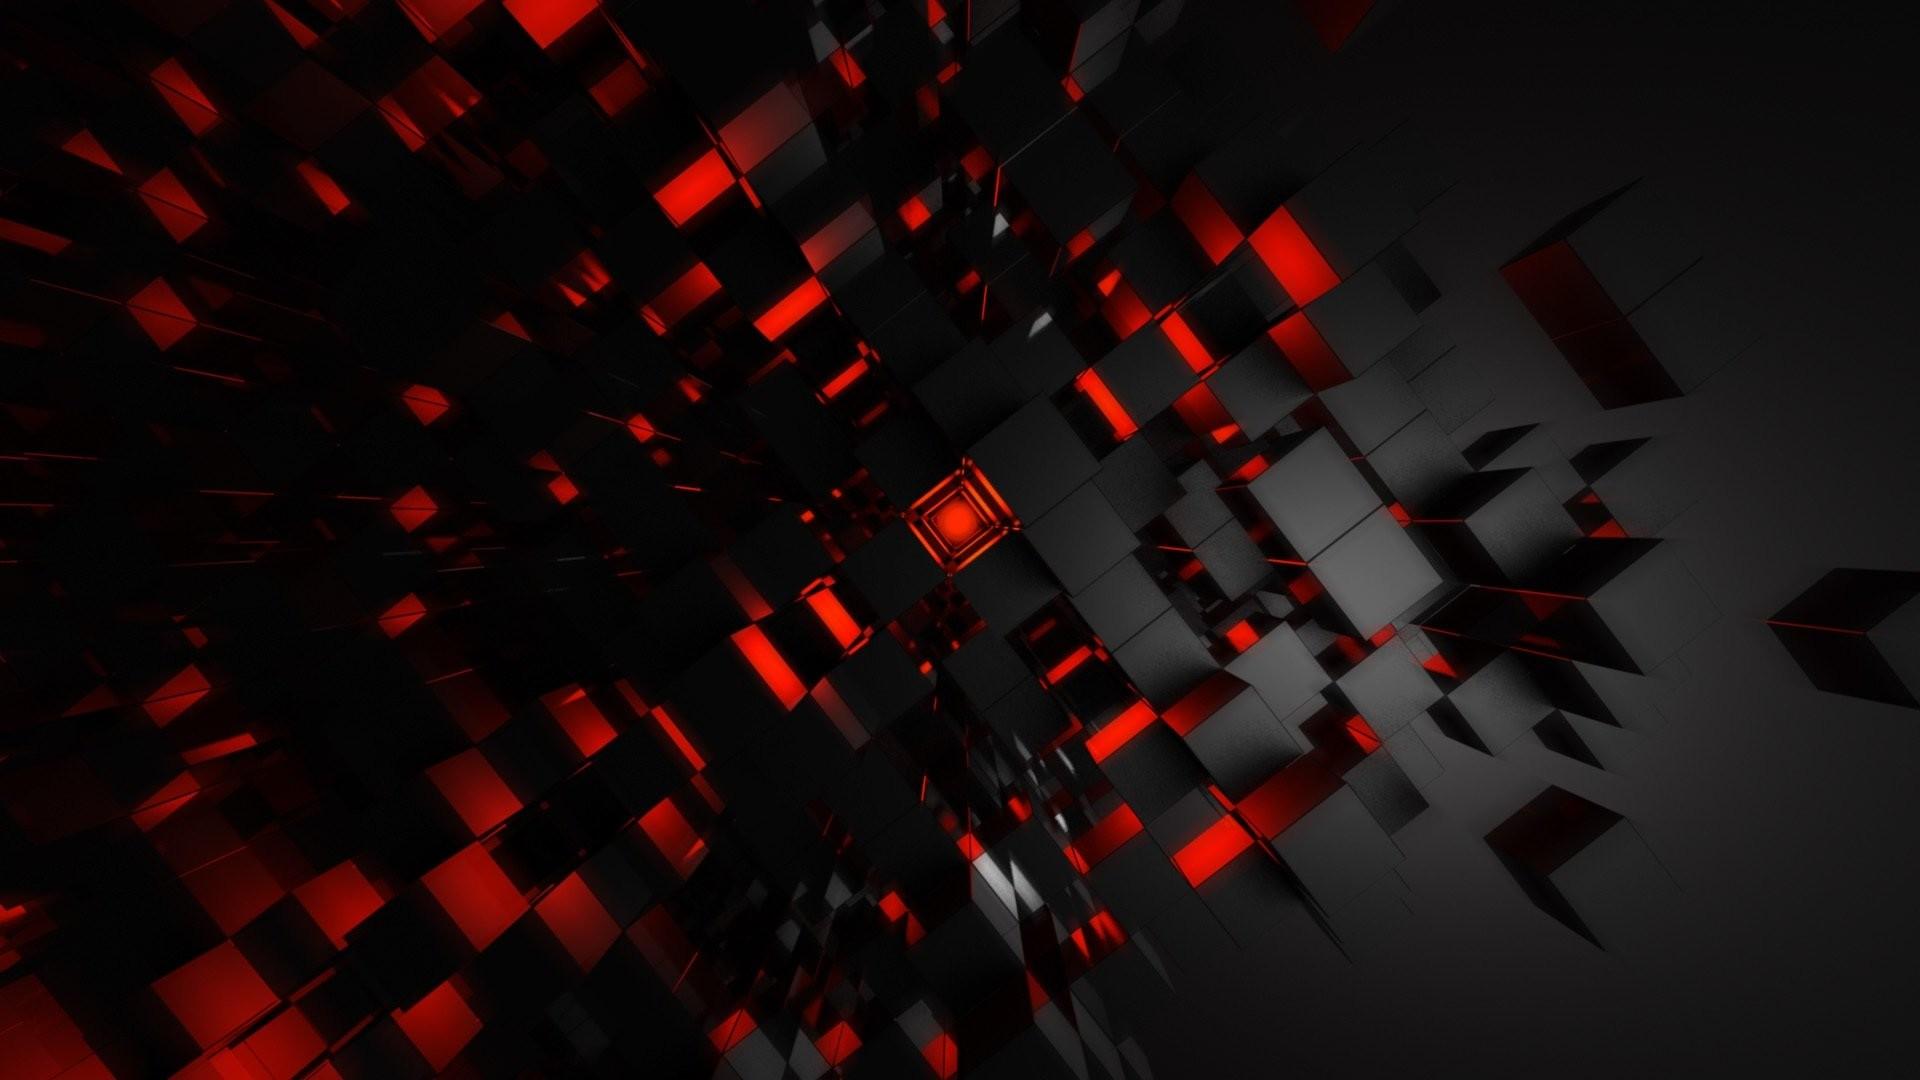 red wallpaper 1 red wallpaper 2 …